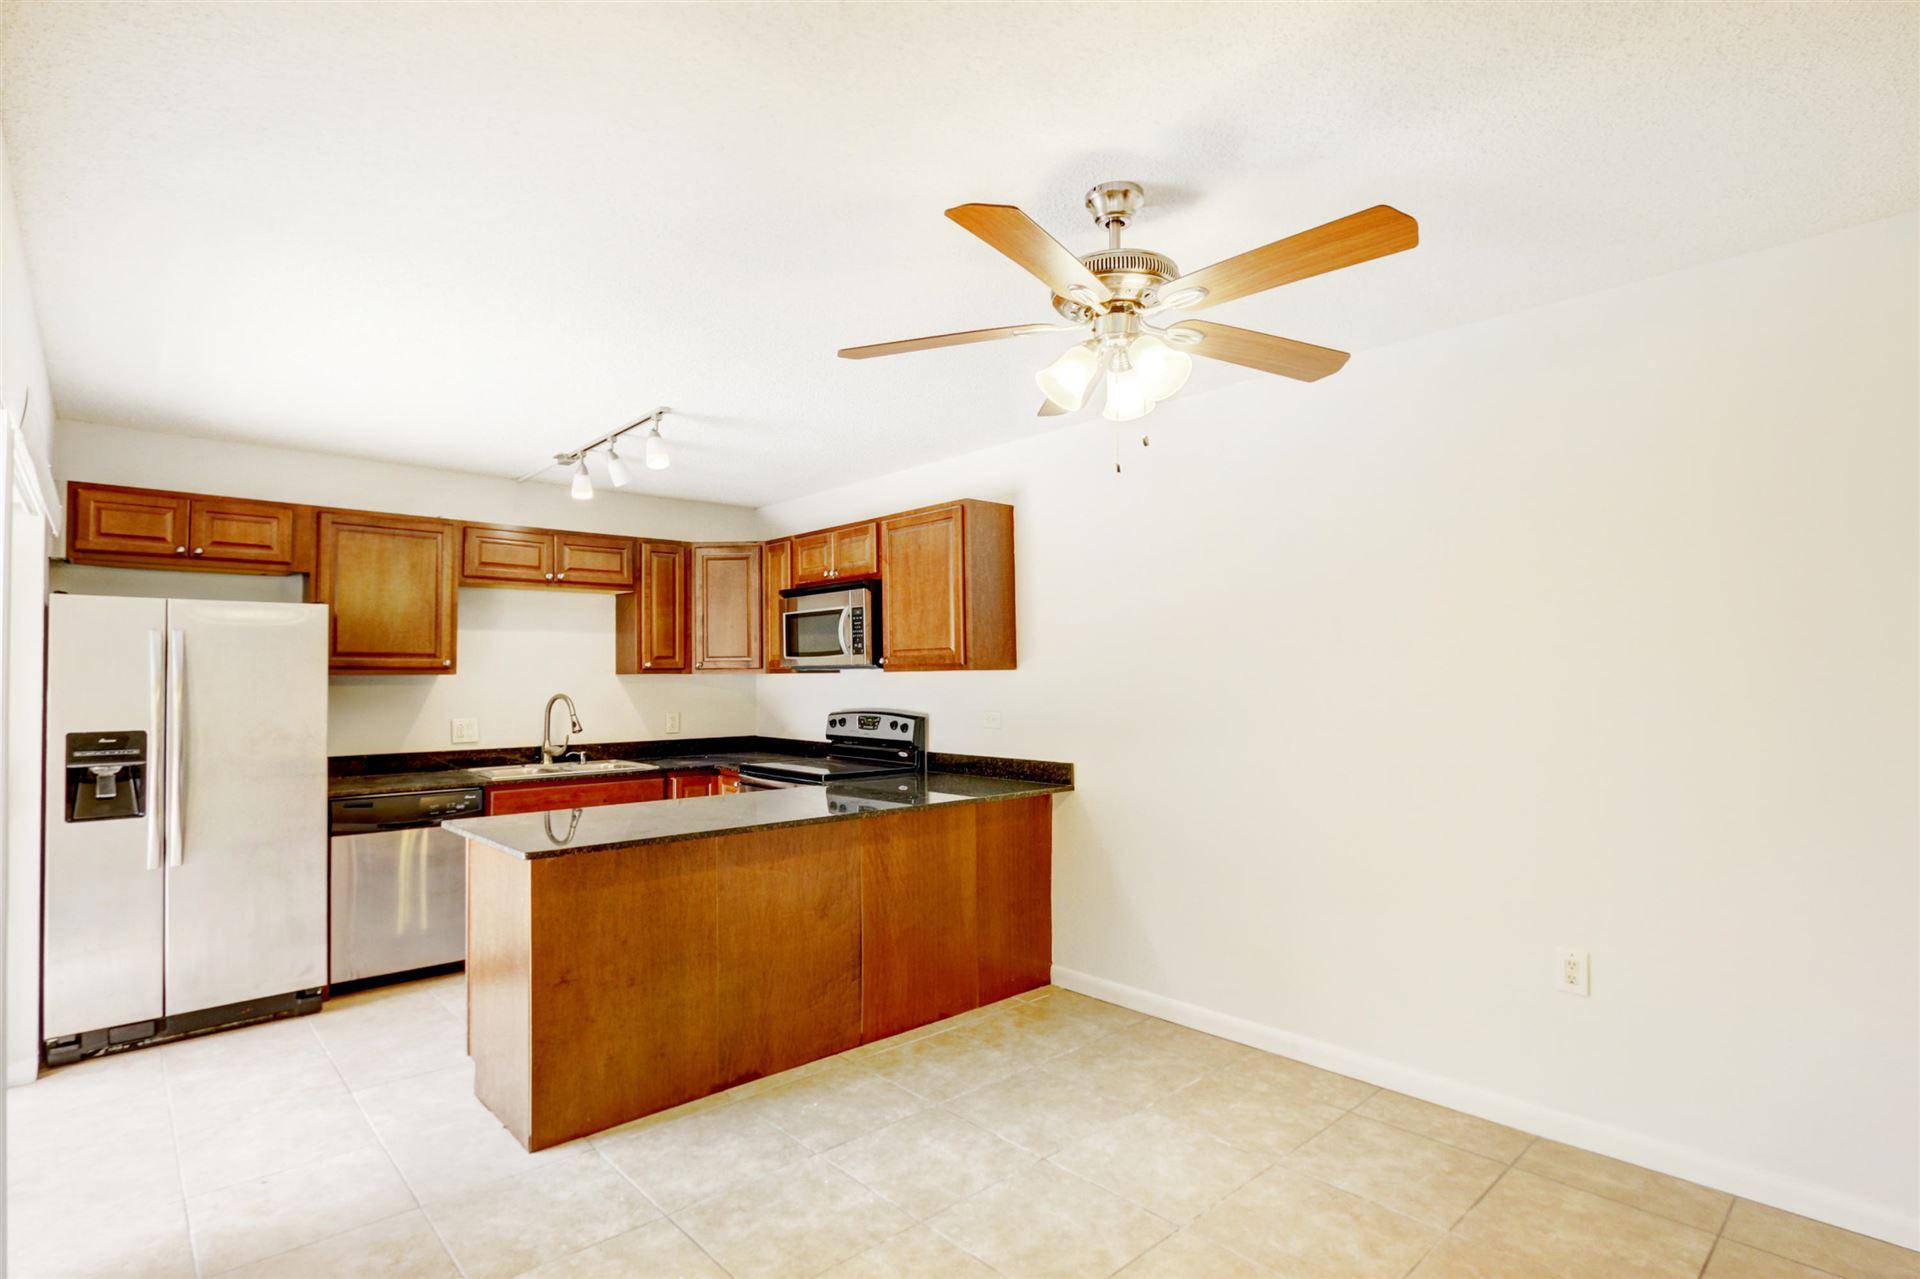 Photo of 1011 10th Terrace, Palm Beach Gardens, FL 33418 (MLS # RX-10643770)